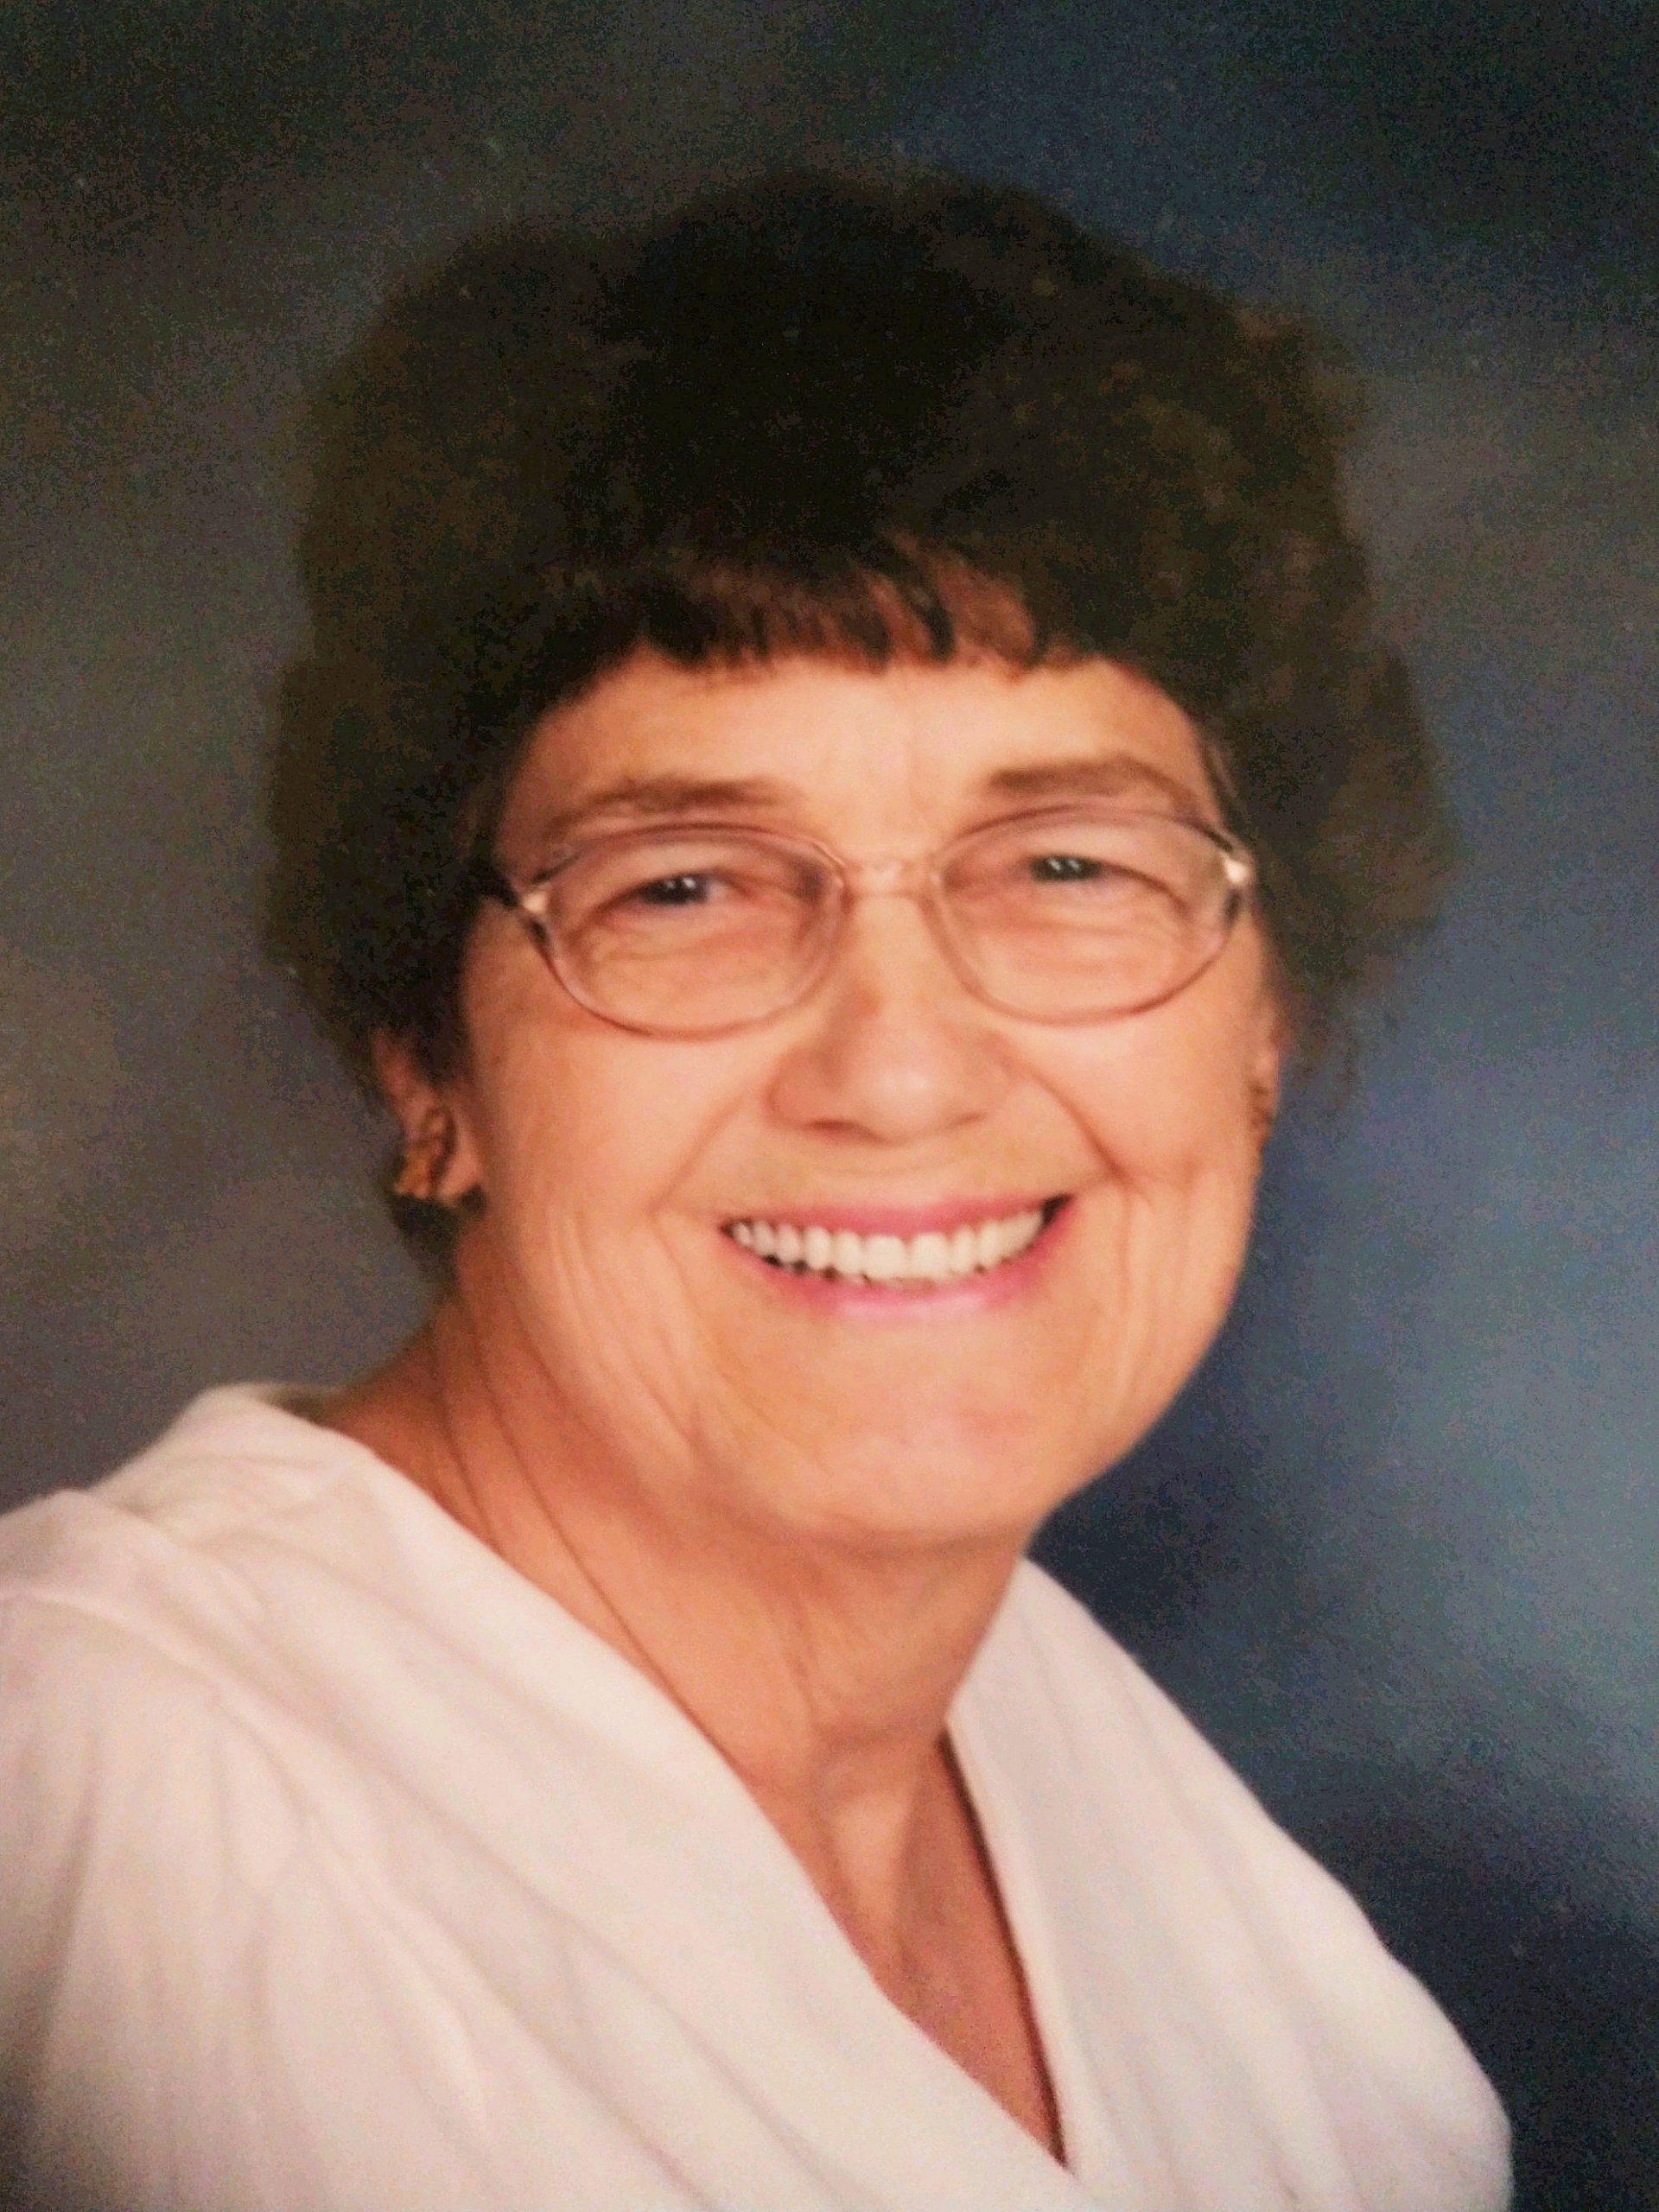 Corinne G. Wroblewski, 76